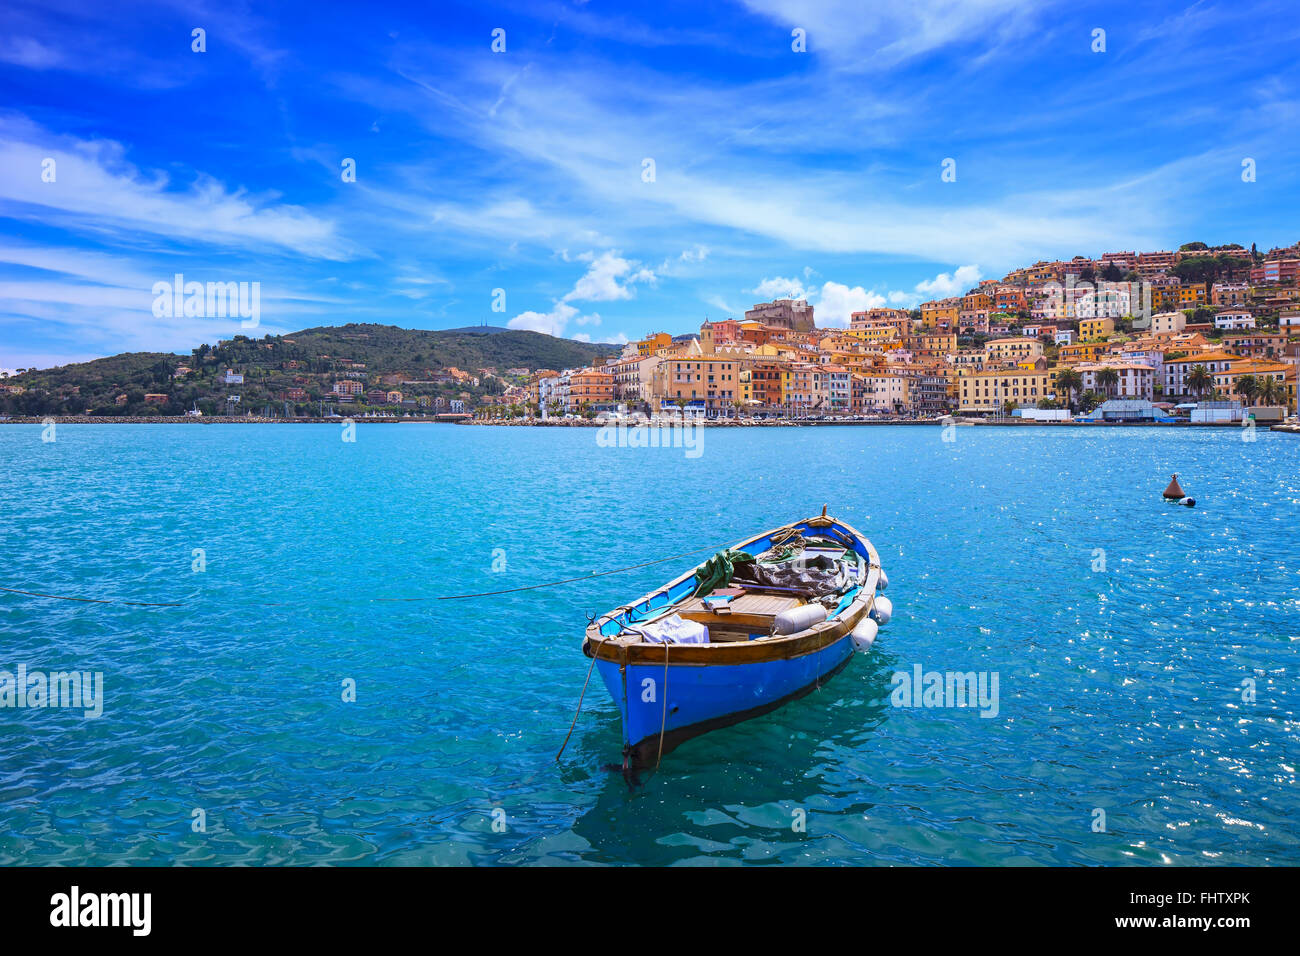 Wooden small old boat in Porto Santo Stefano seafront, italian travel destination. Monte Argentario, Tuscany, Italy. - Stock Image